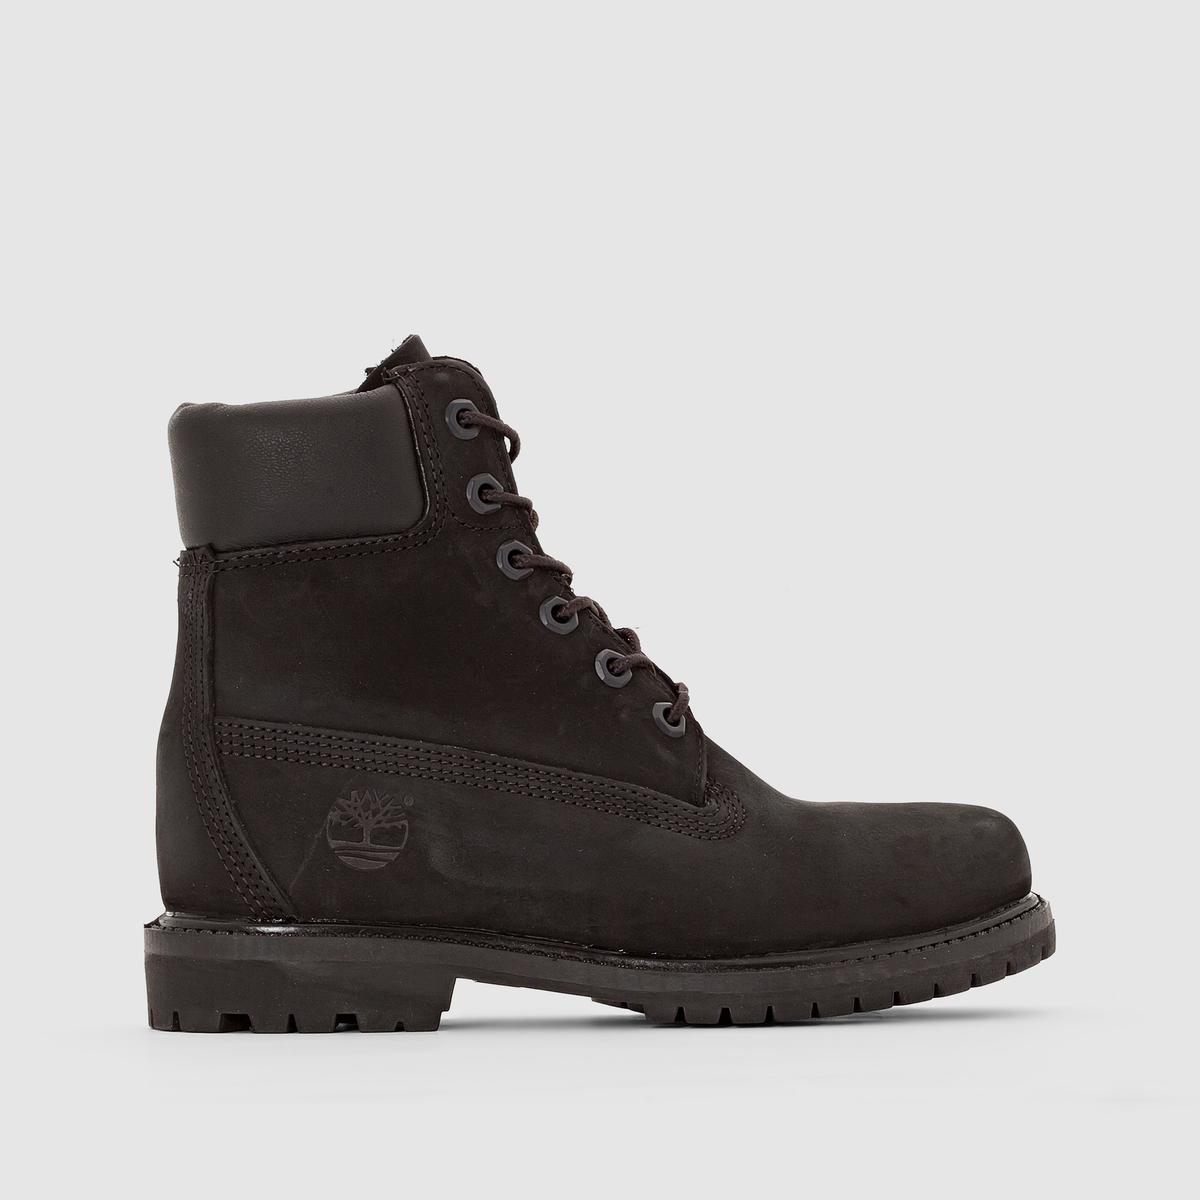 Botines con cordones 6in Premium Boot-W